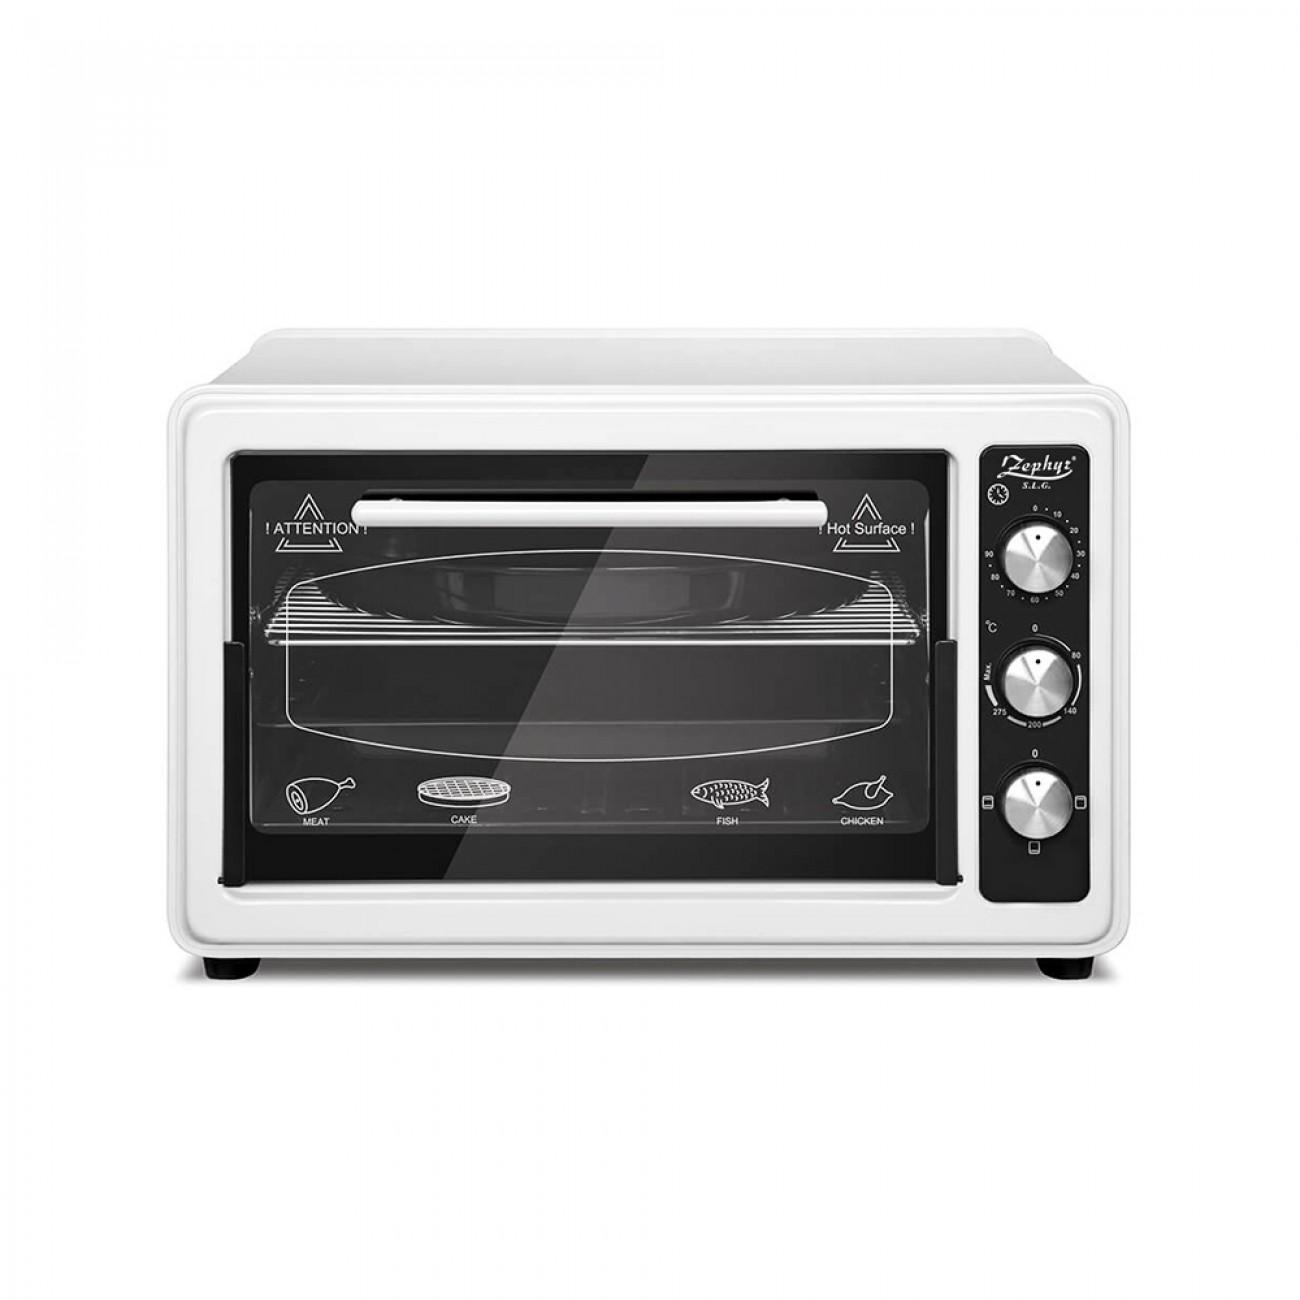 Готварска печка ZEPHYR ZP 1441 T40, 1400W, 40 литра, Терморегулатор, Таймер, Тава 34 см, Бял в Готварски печки - ZEPHYR | Alleop